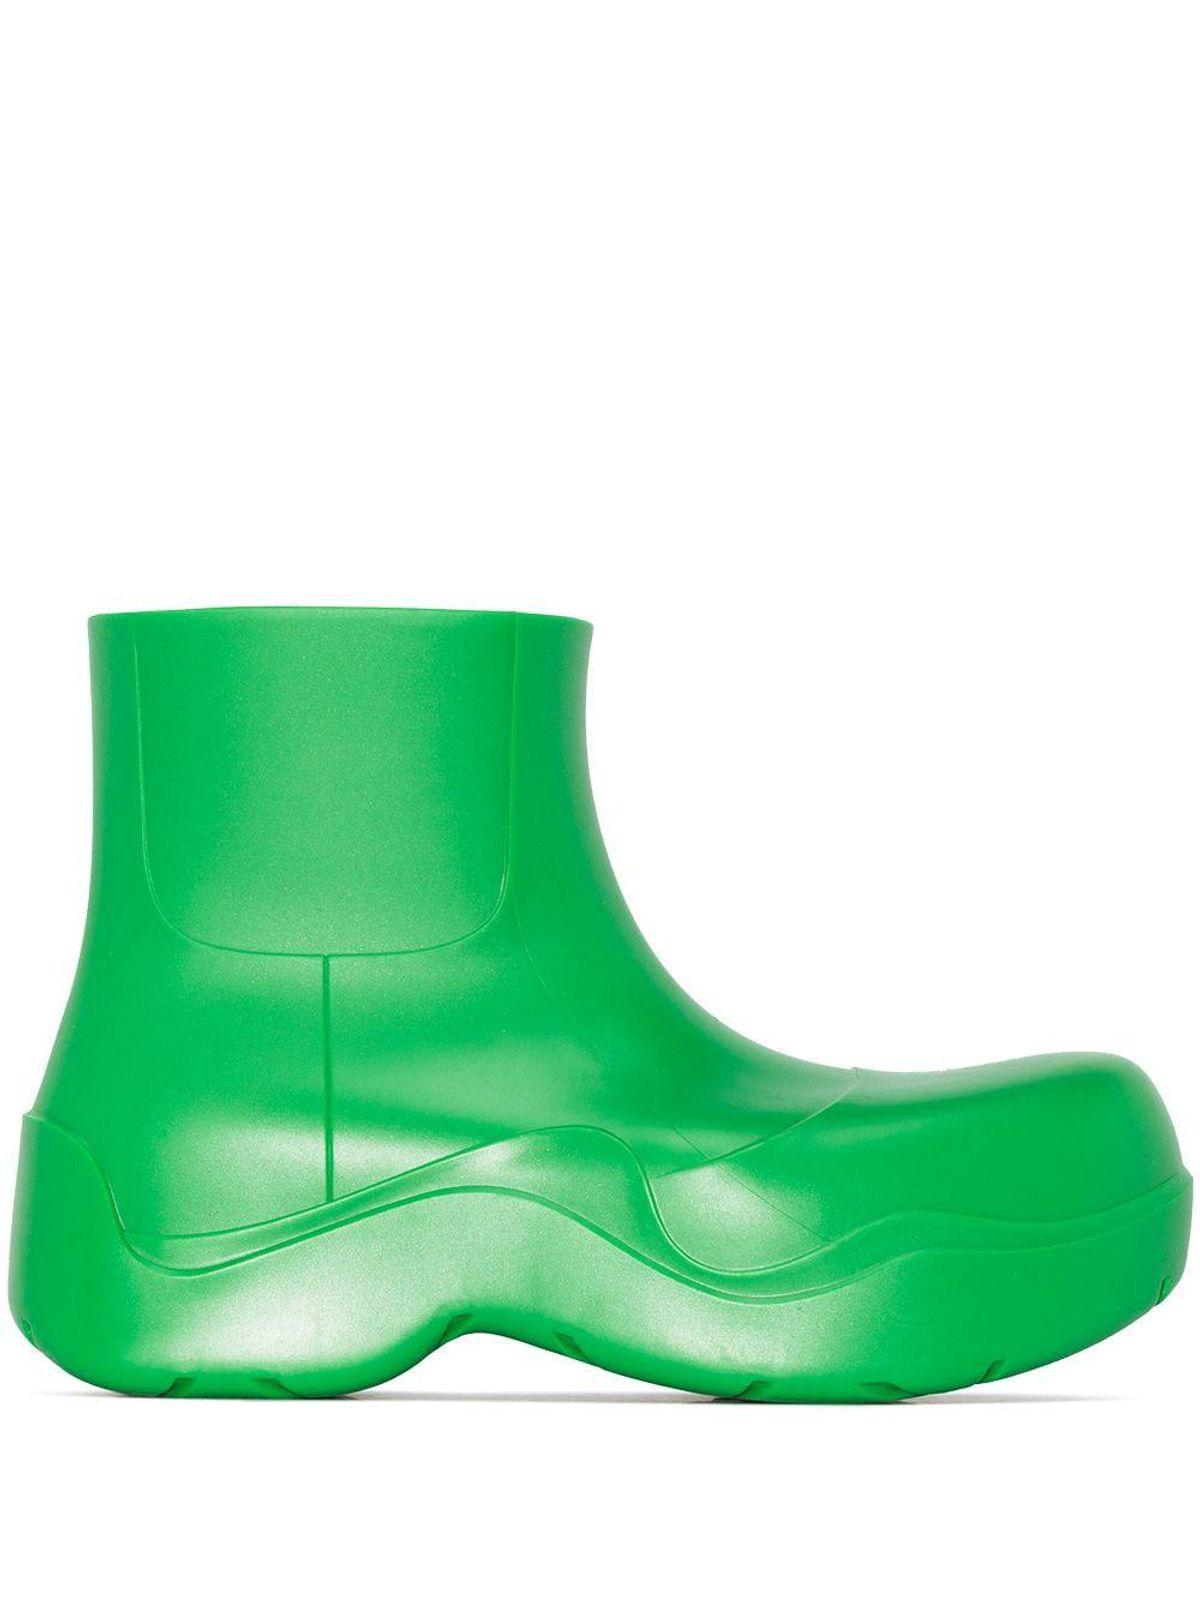 bottega veneta puddle ankle boots